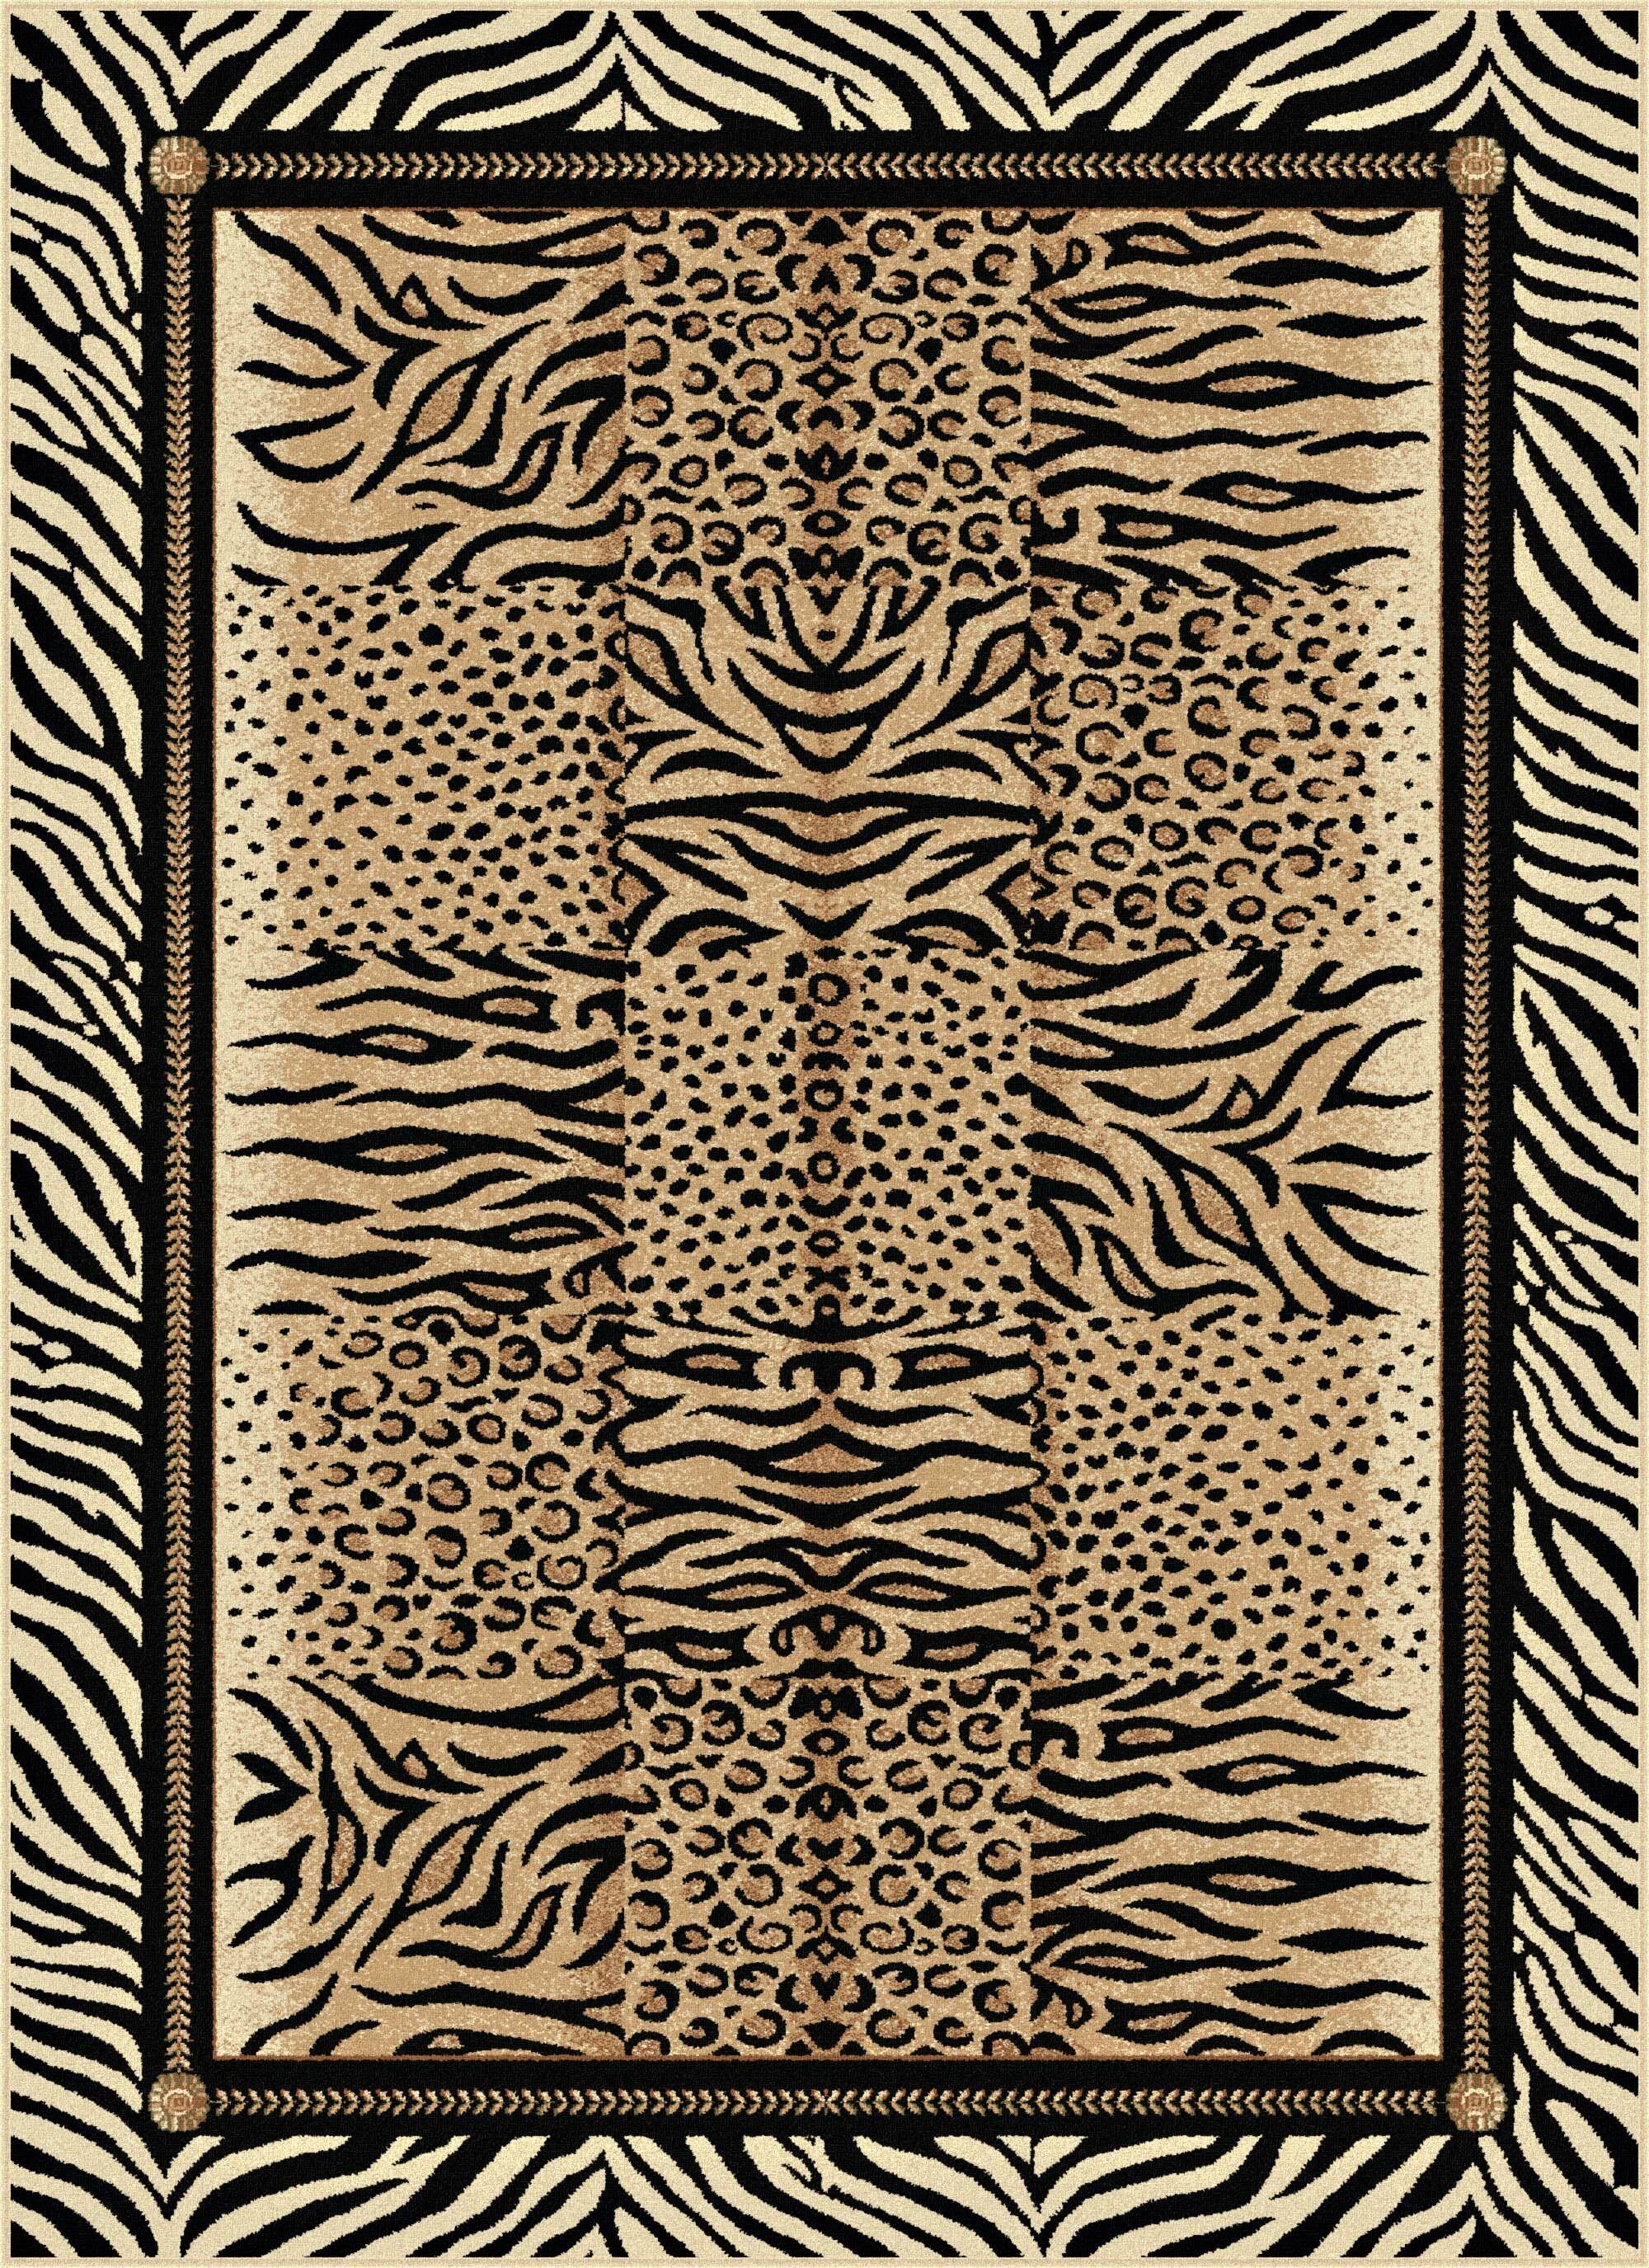 Carden Beige Area Rug Rug Size: 5'3'' x 7'3''